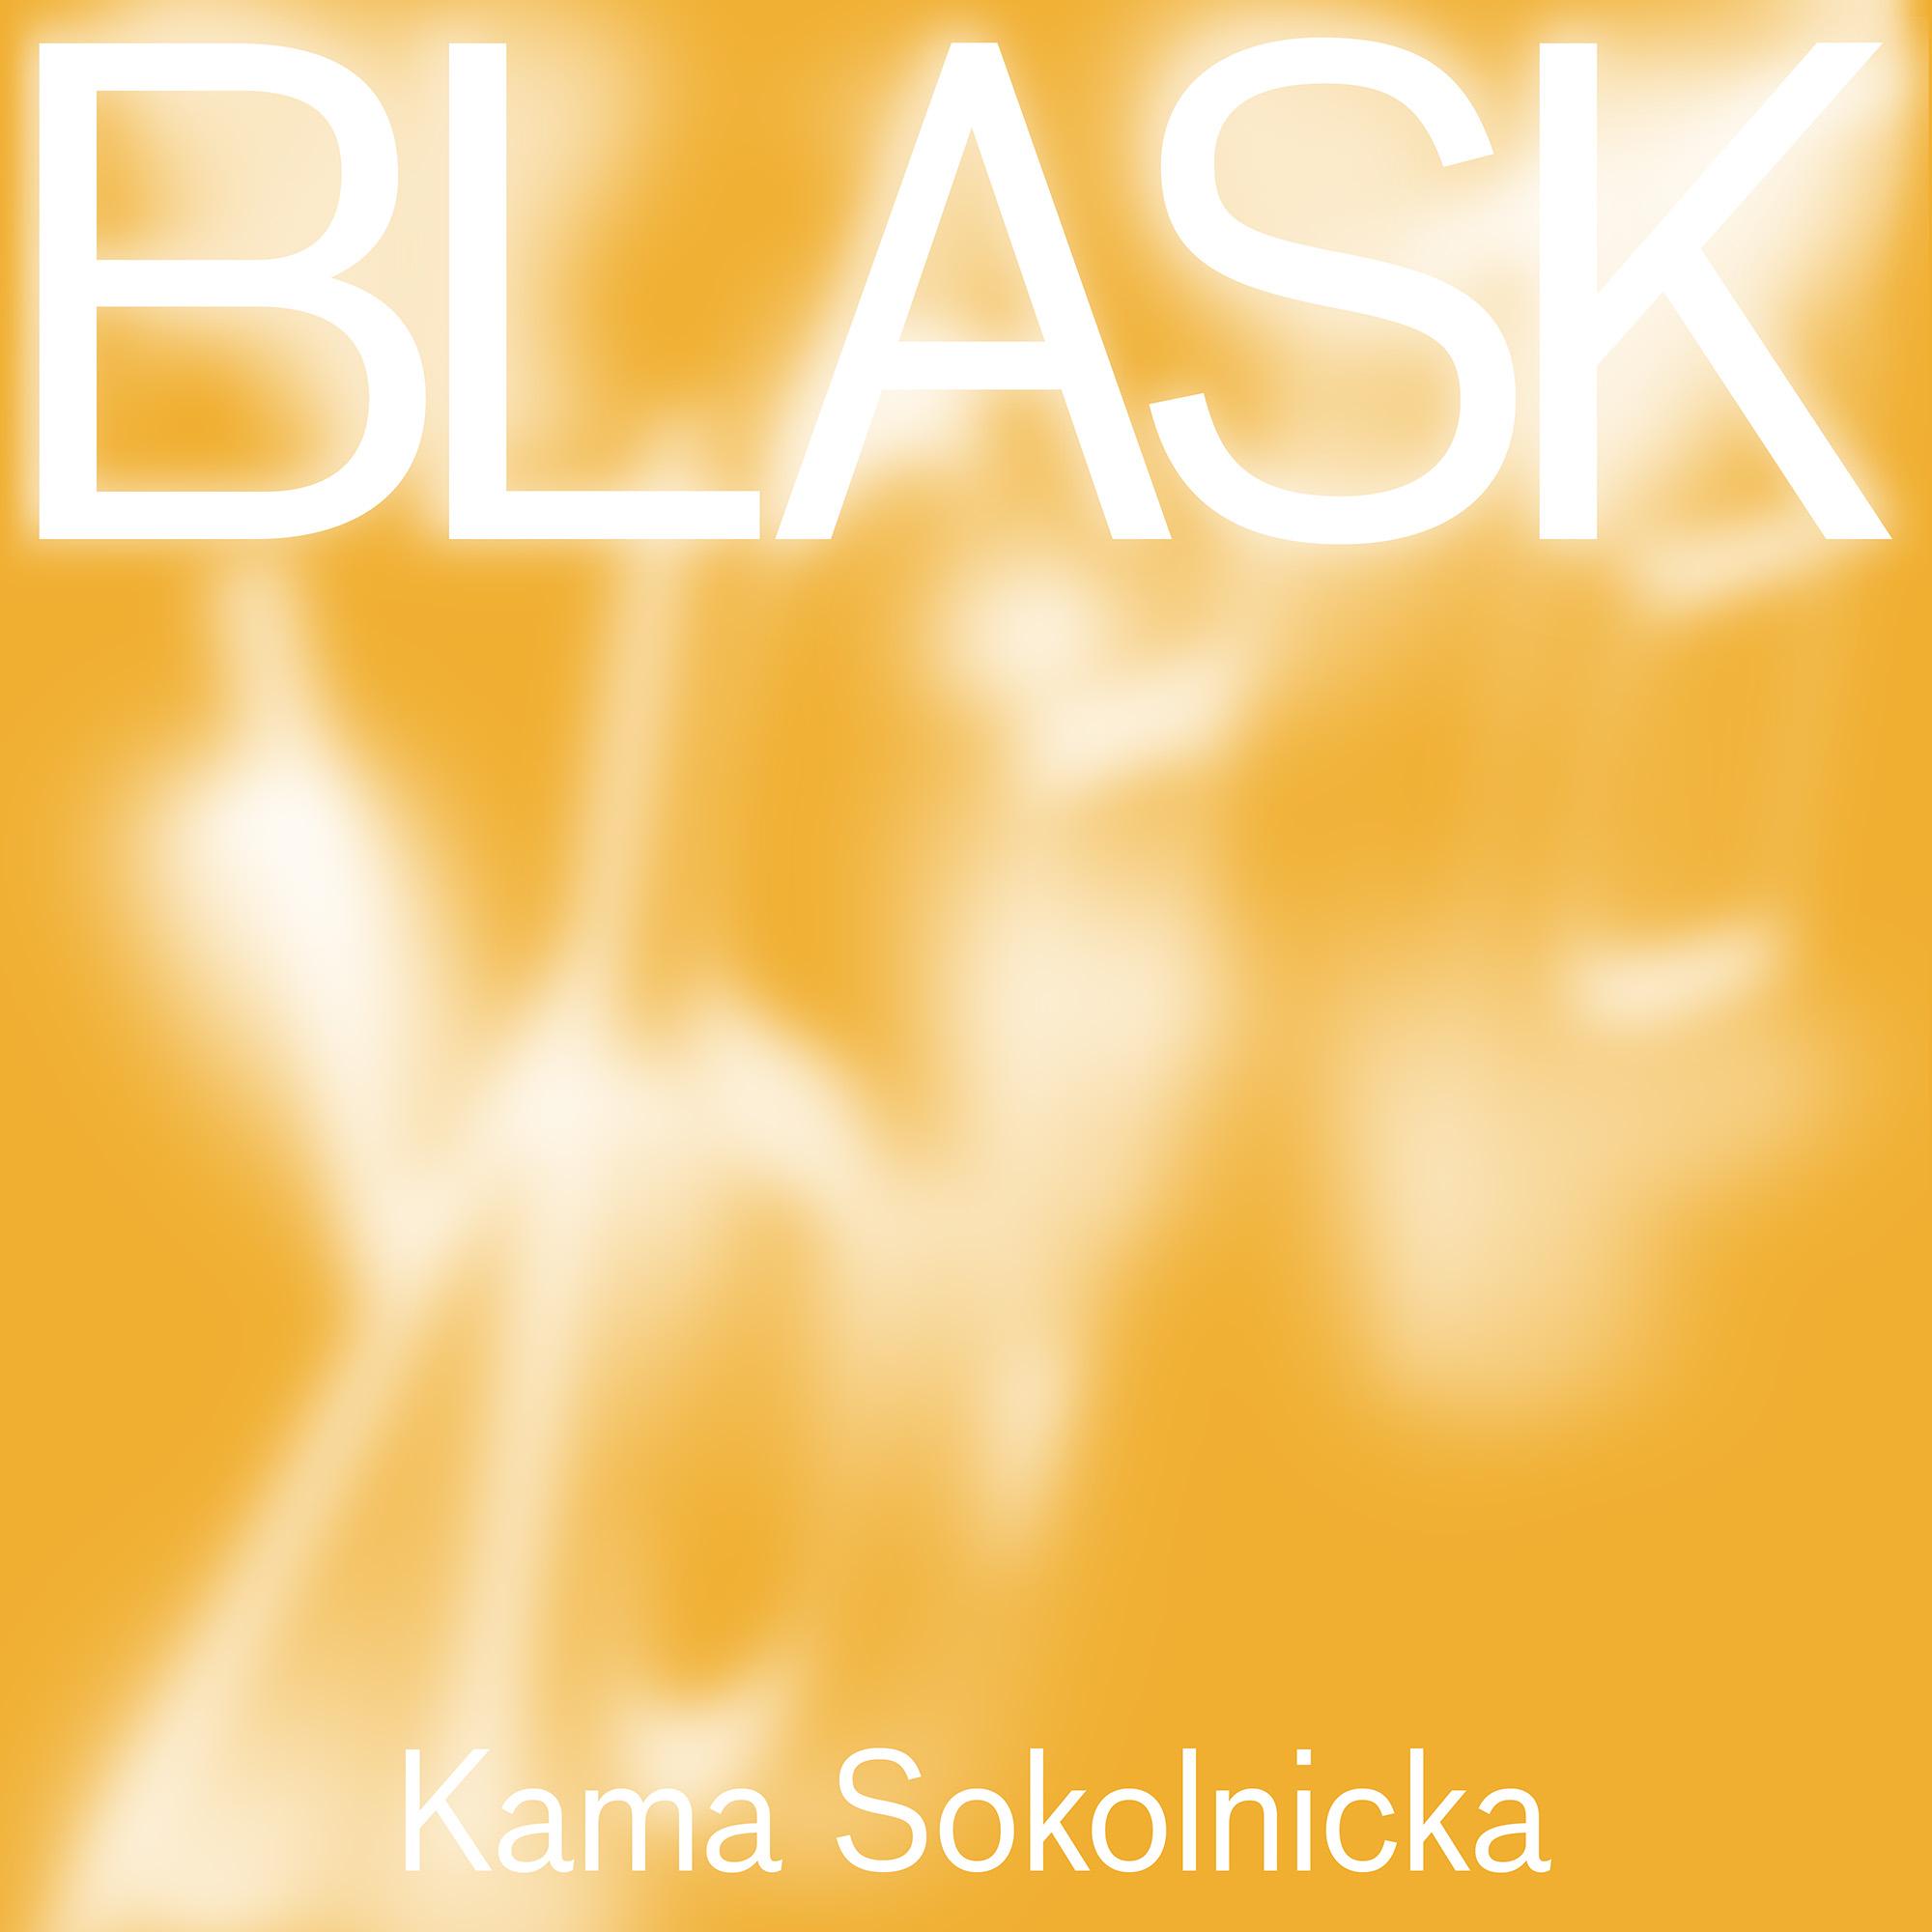 Kama Sokolnicka. Glare